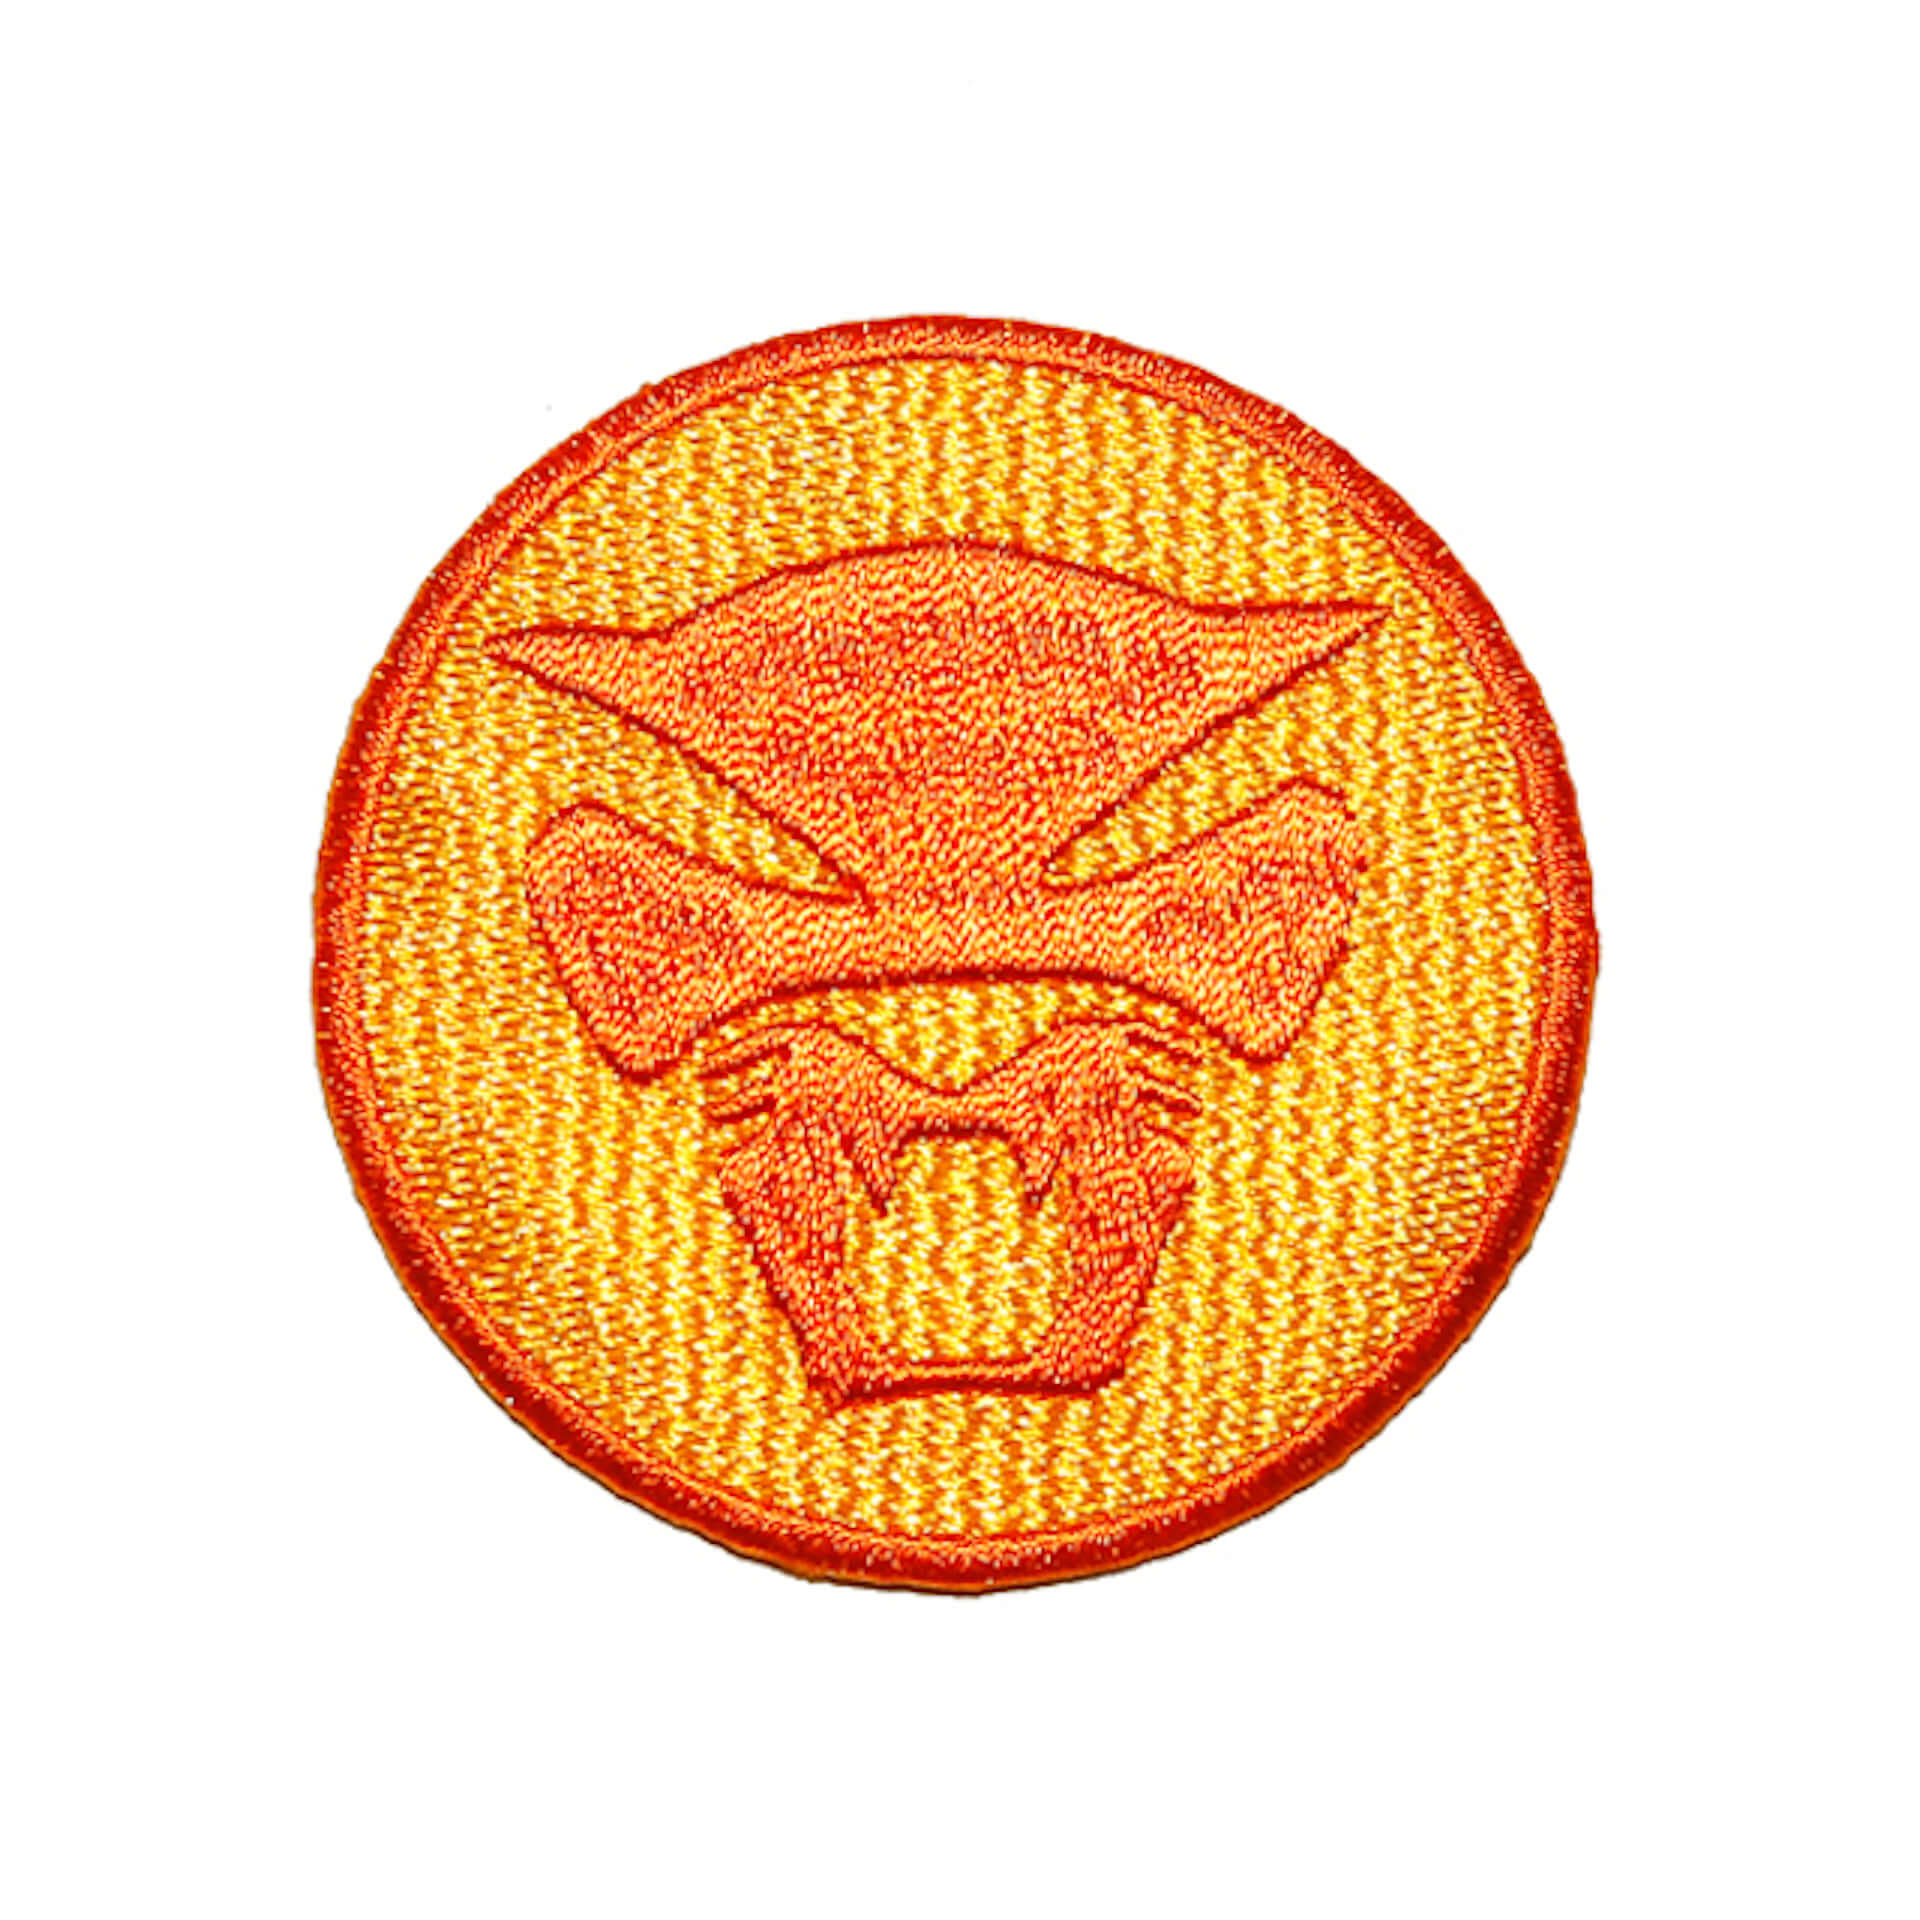 "Thundercatの大ヒットシングル""Dragonball Durag""のリミックスバージョンが公開!SminoとGuapdad 4000が参加 music2000826_thundercat_1-1920x1920"